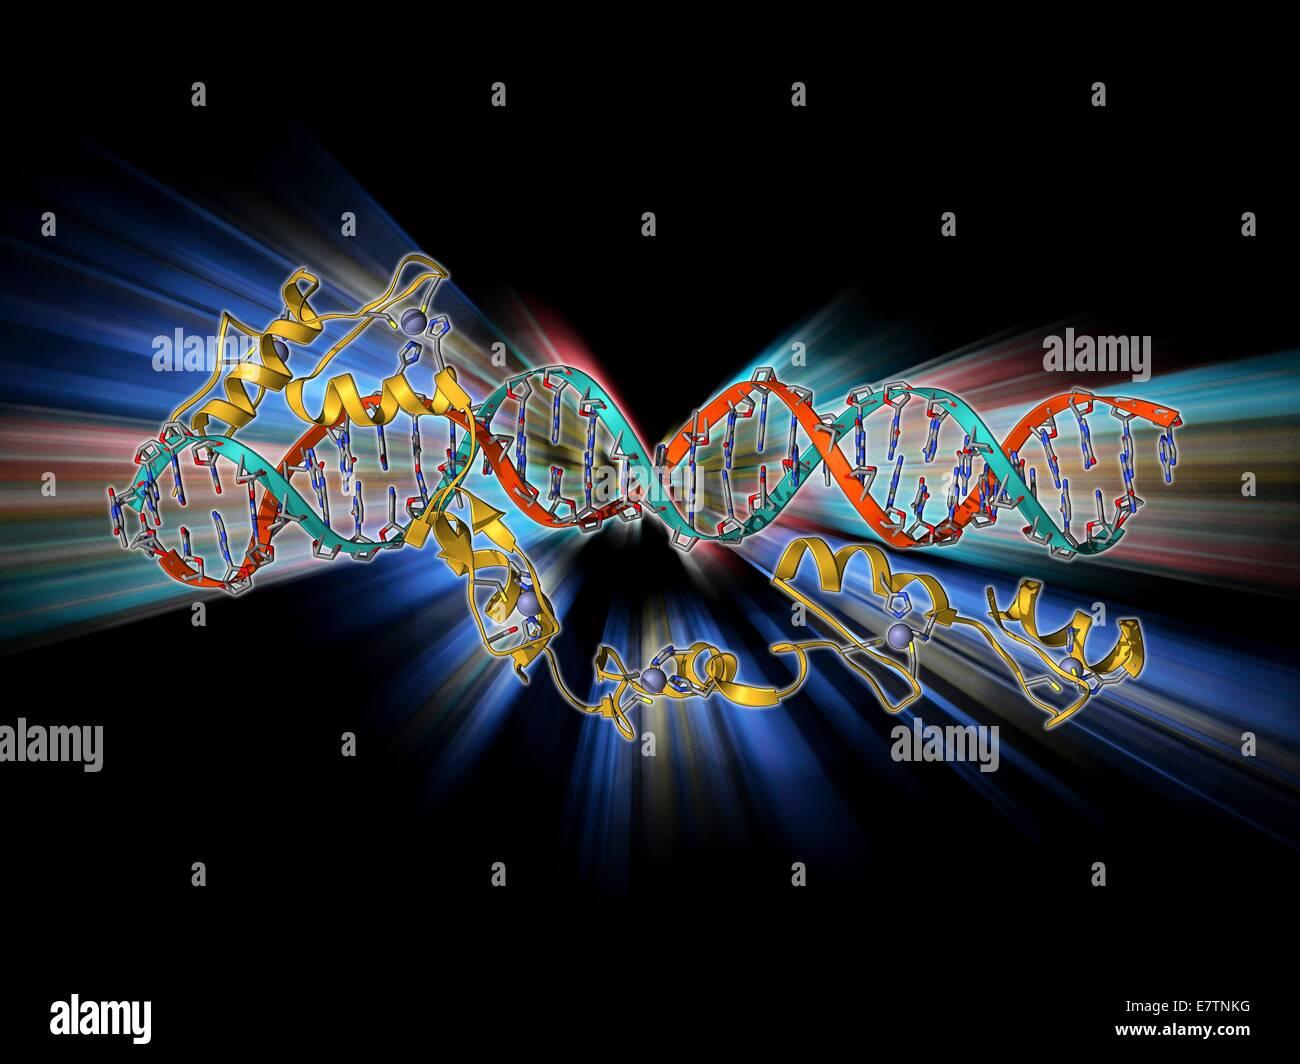 Transcription factor and ribosomal RNA (rRNA). Molecular model showing the 6 zinc fingers of transcription factor Stock Photo